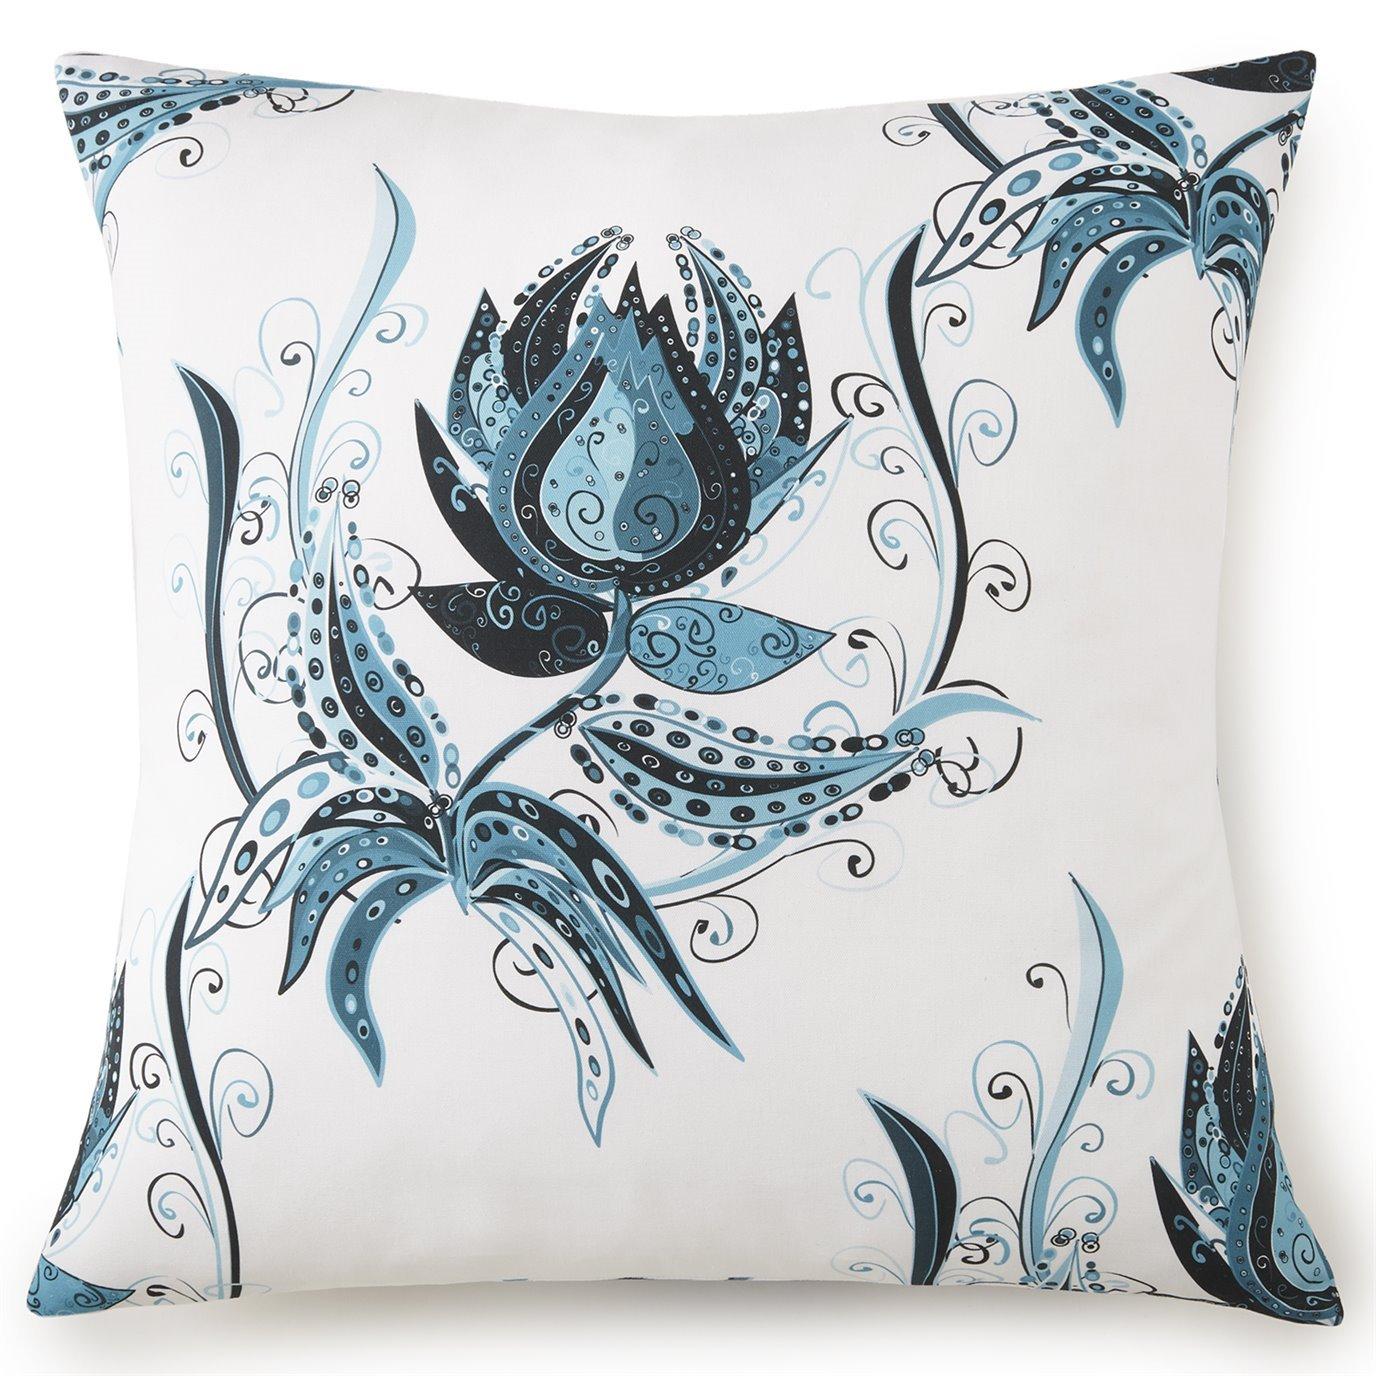 Tropical Bloom Euro Sham - White Background, Blue Print